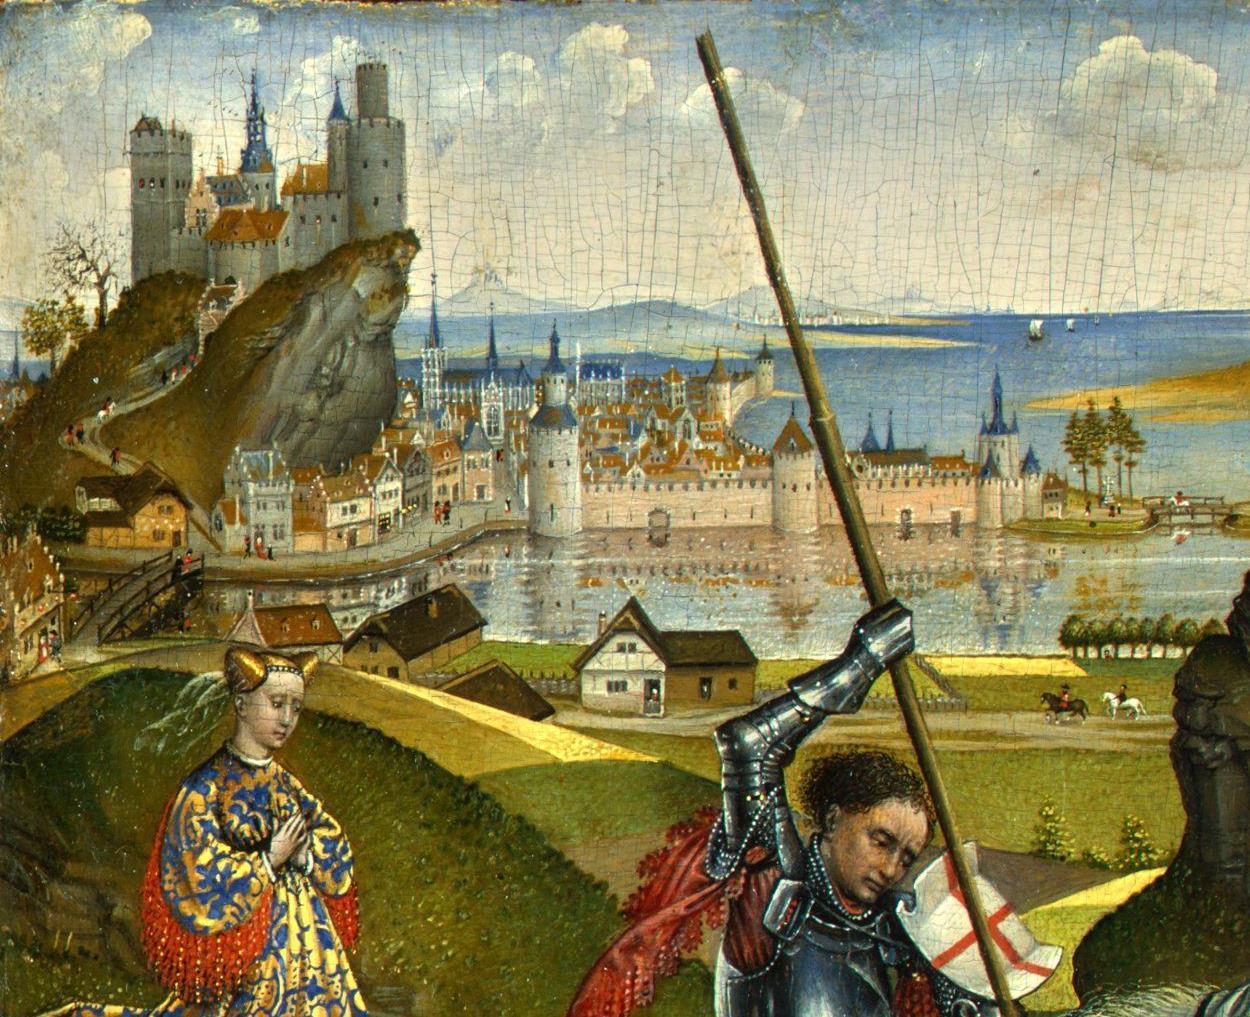 rogier_van_der_weyden_saint_george_and_the_dragon_nga_washington-detail.jpg